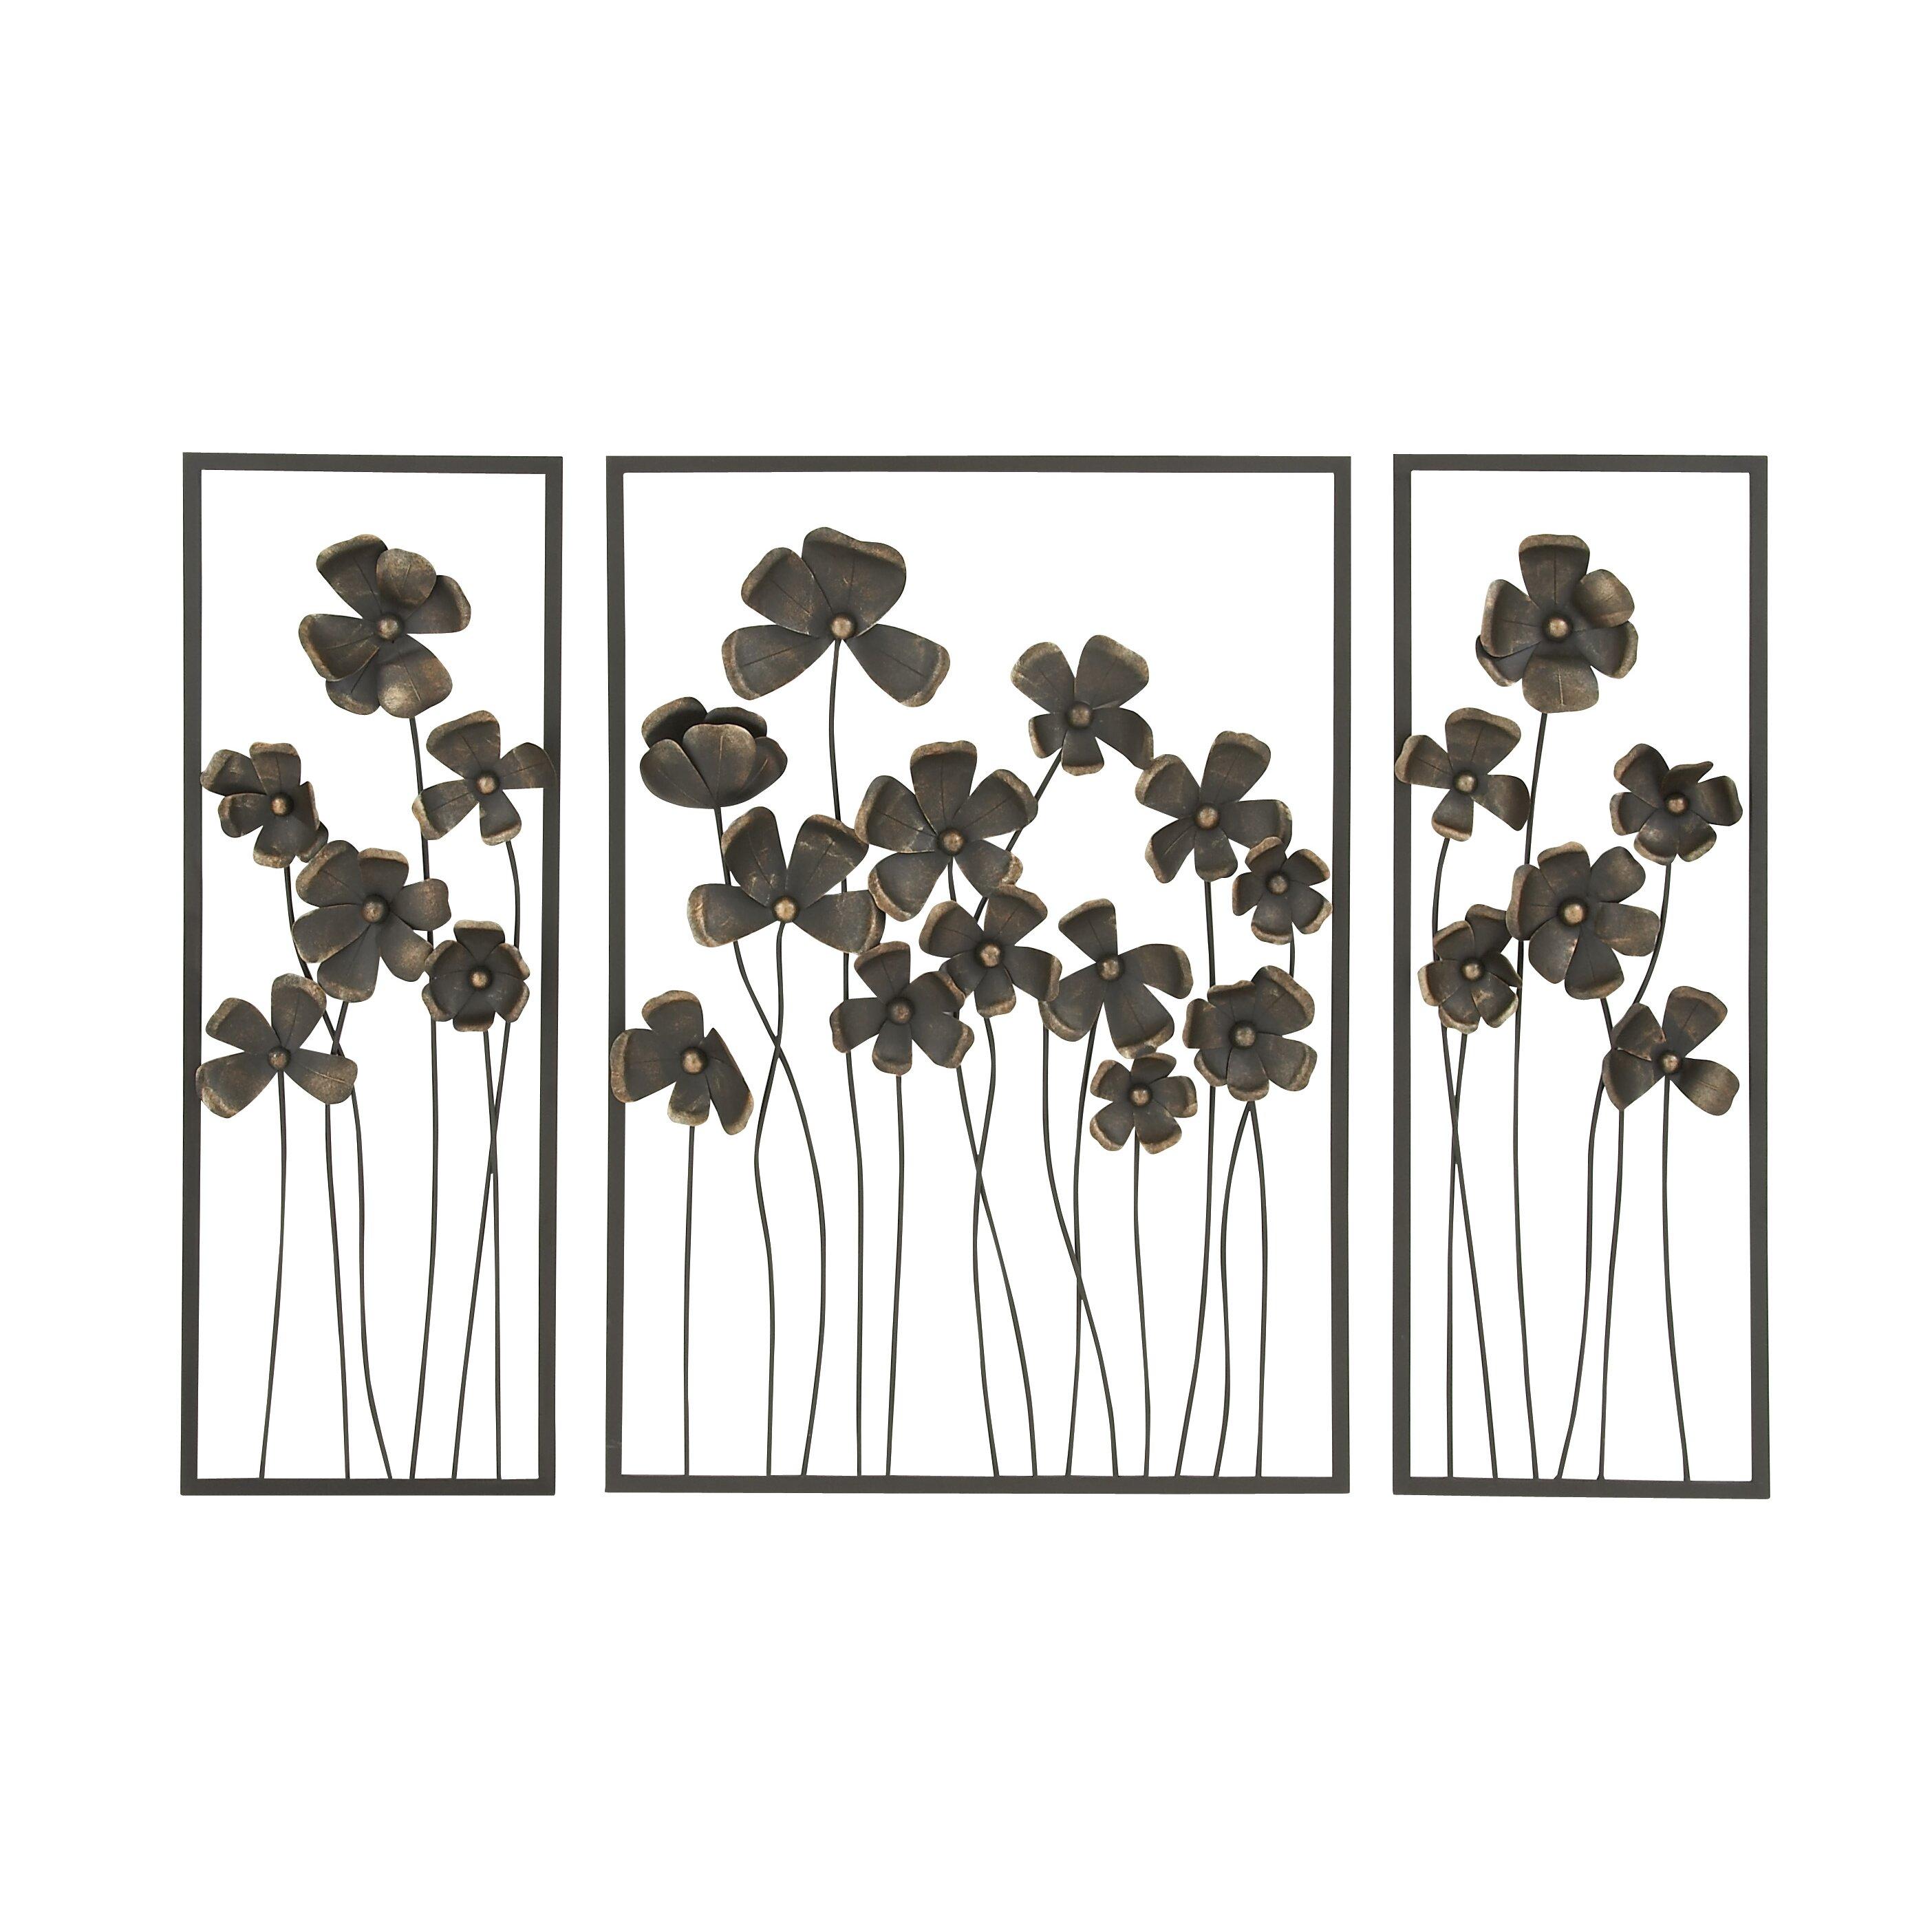 darby home co 3 piece wall d cor set reviews wayfair. Black Bedroom Furniture Sets. Home Design Ideas